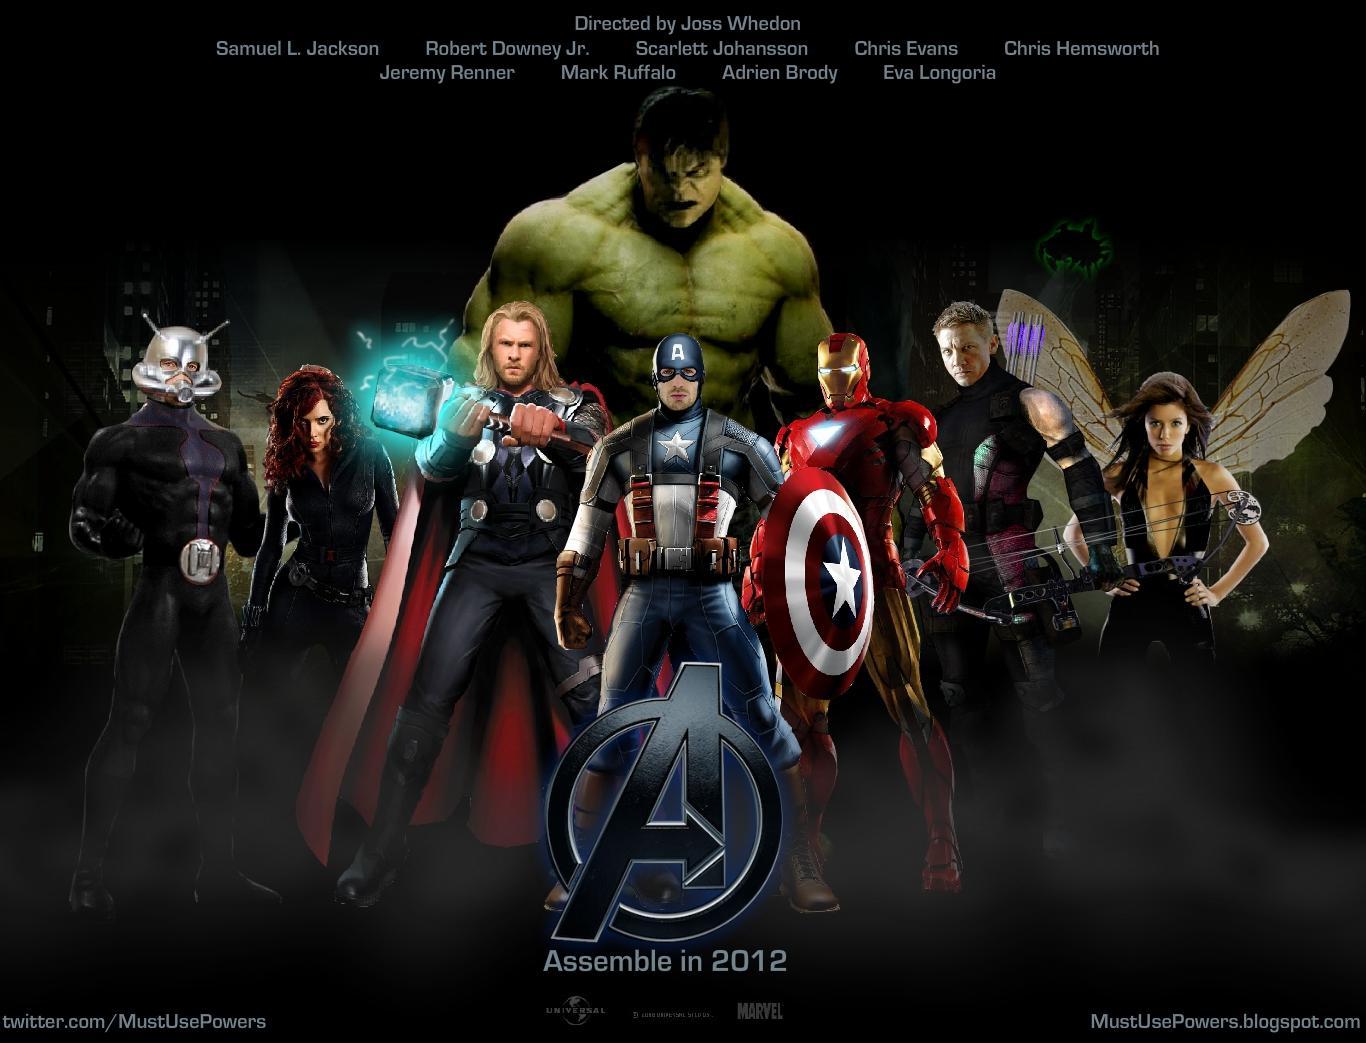 http://3.bp.blogspot.com/_t-Dy2G2jvCI/TFIJrlGQUKI/AAAAAAAAAvQ/EQVoqDwEOZ8/s1600/avengers-billboard-13.jpg